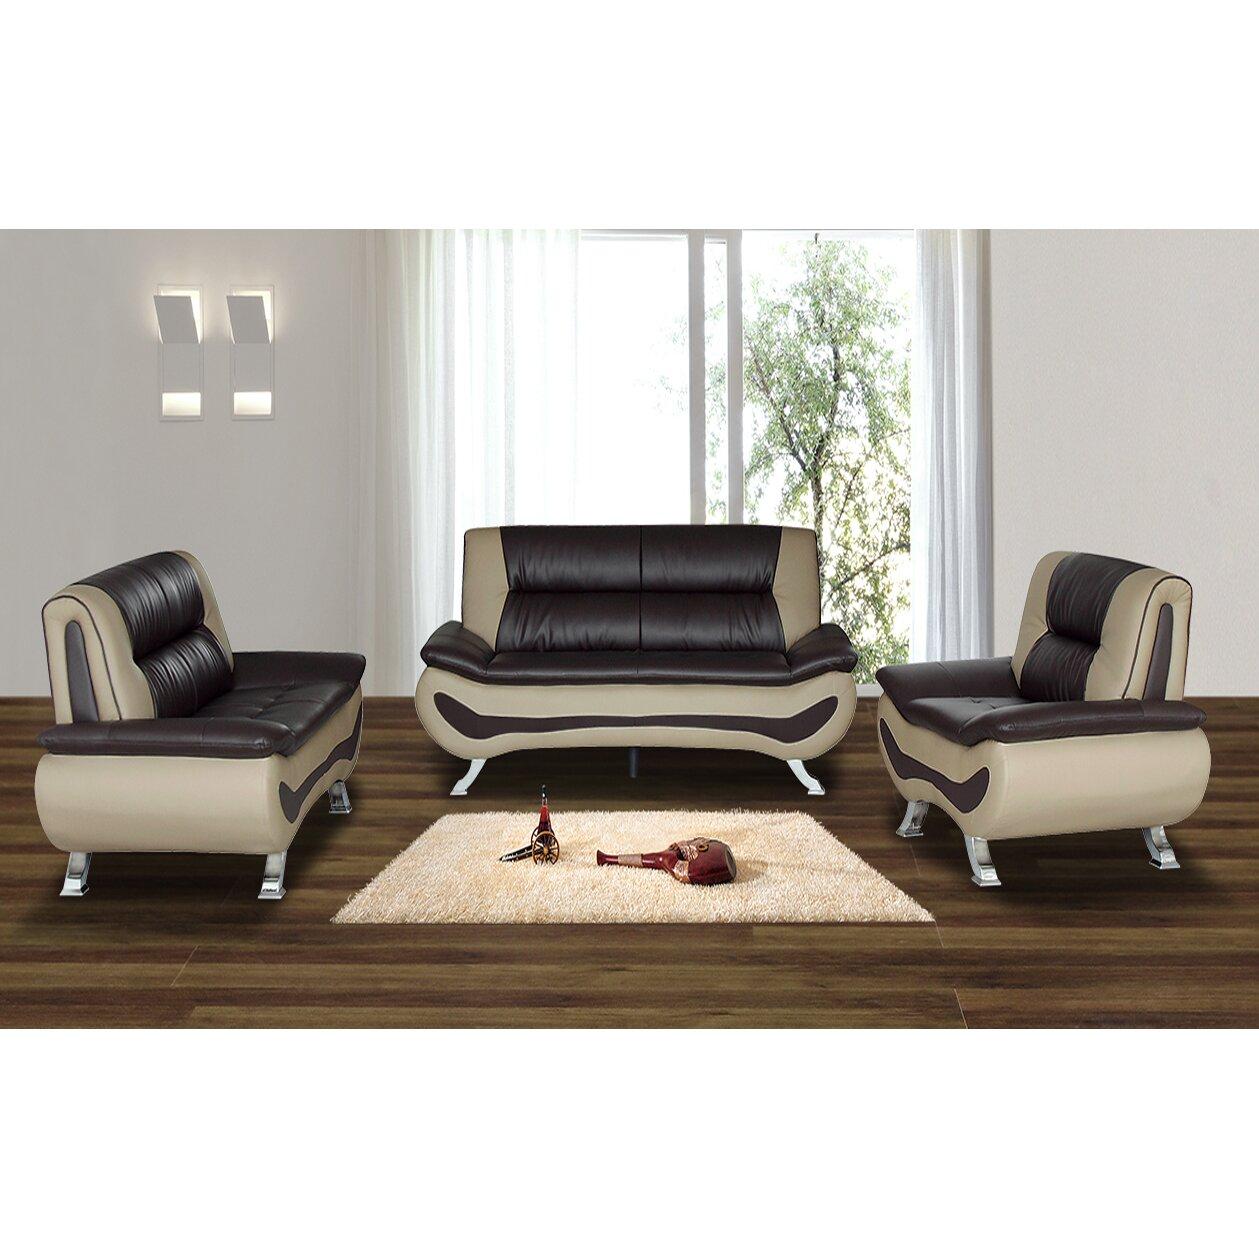 living in style austin 3 piece living room set & reviews | wayfair